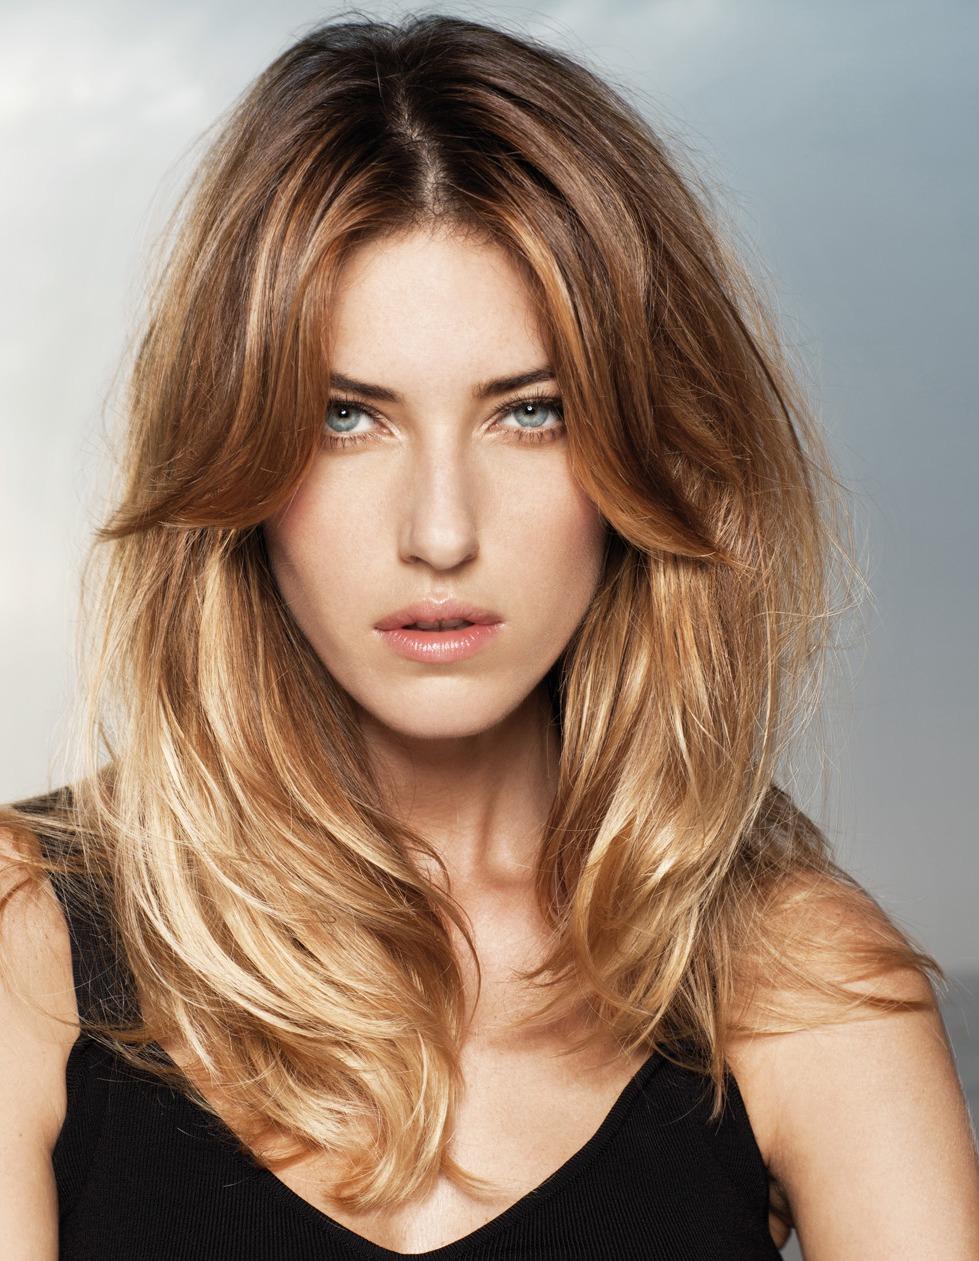 Фото новинка: модный каскад на коротких волосах